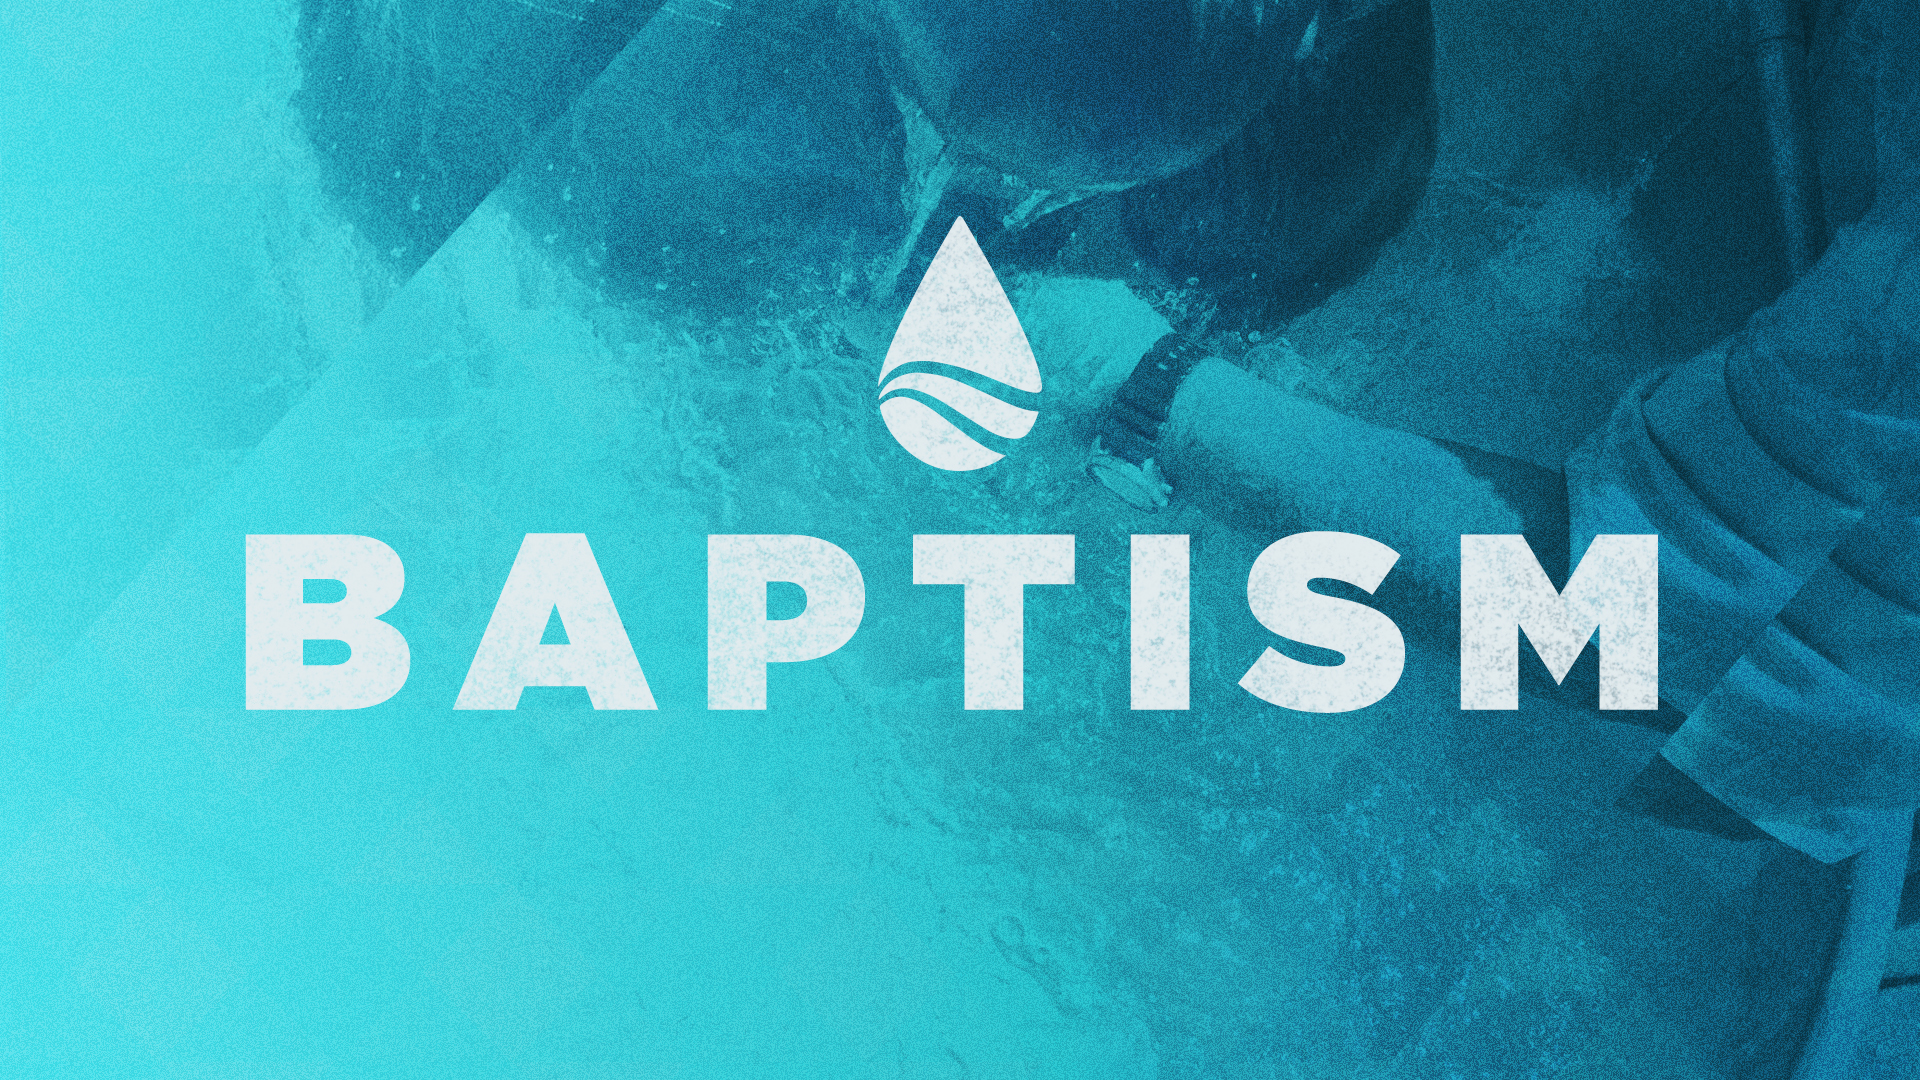 Baptism slide new